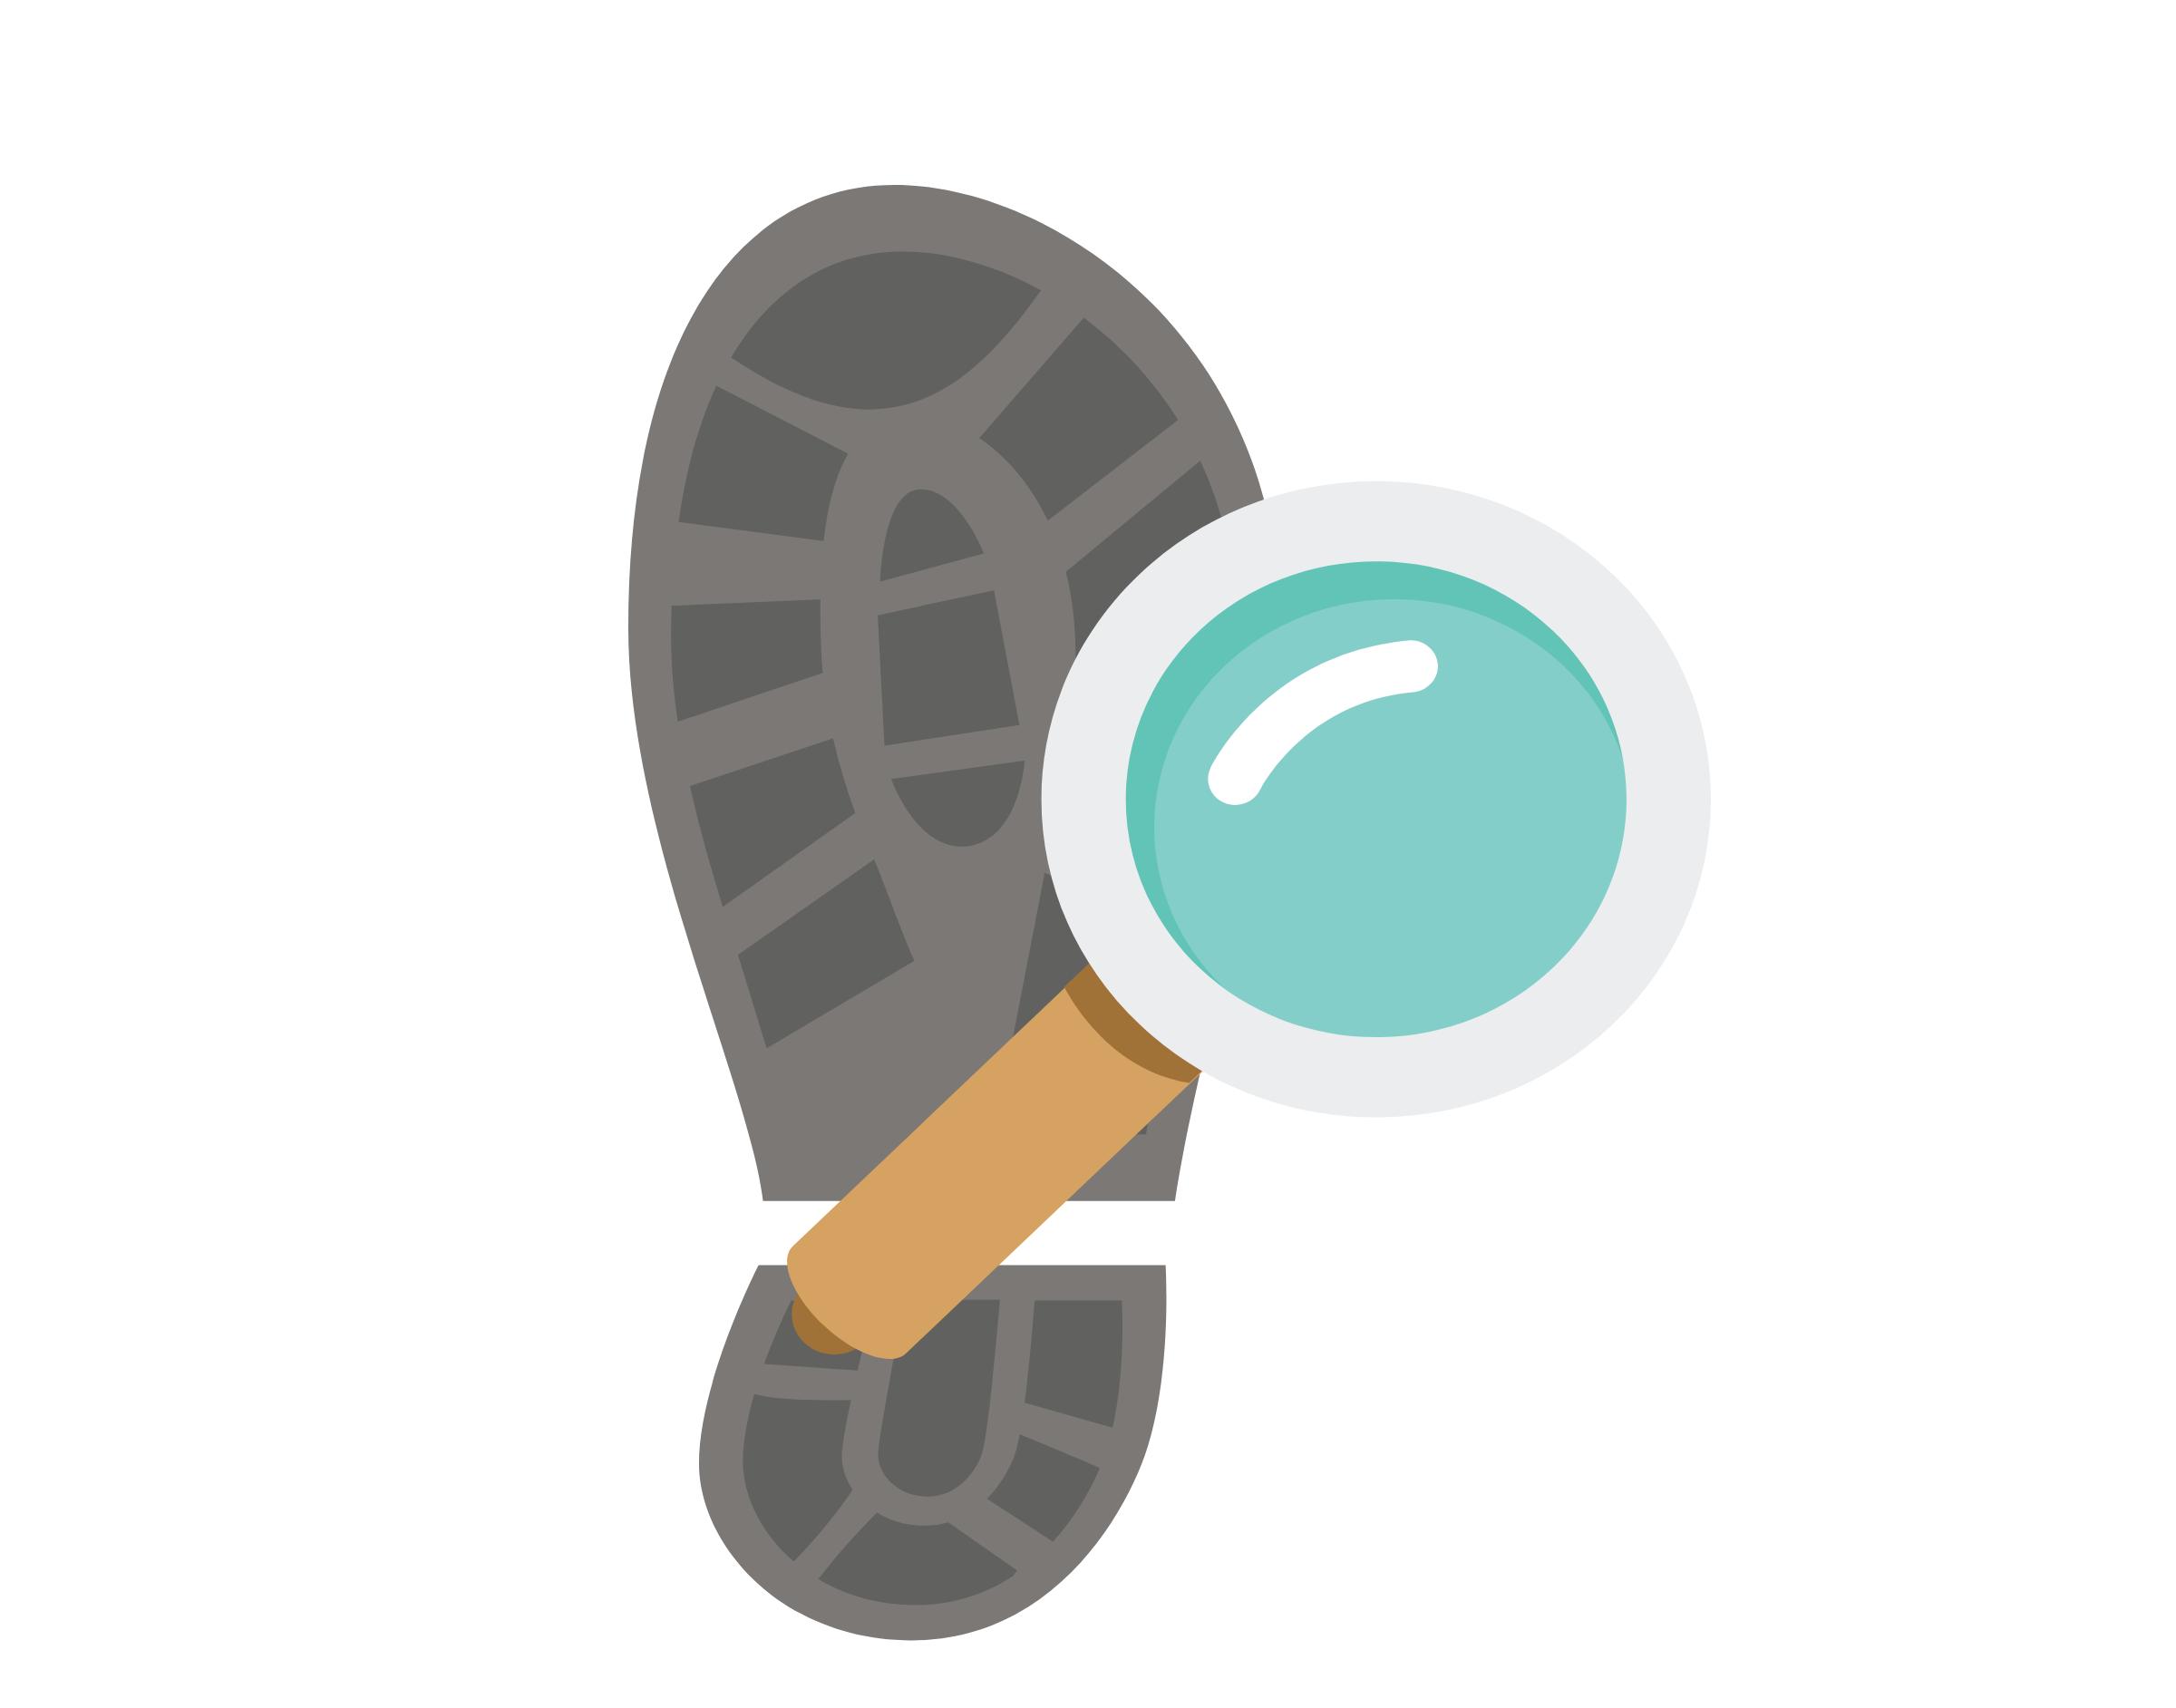 magnifying glass, footprint